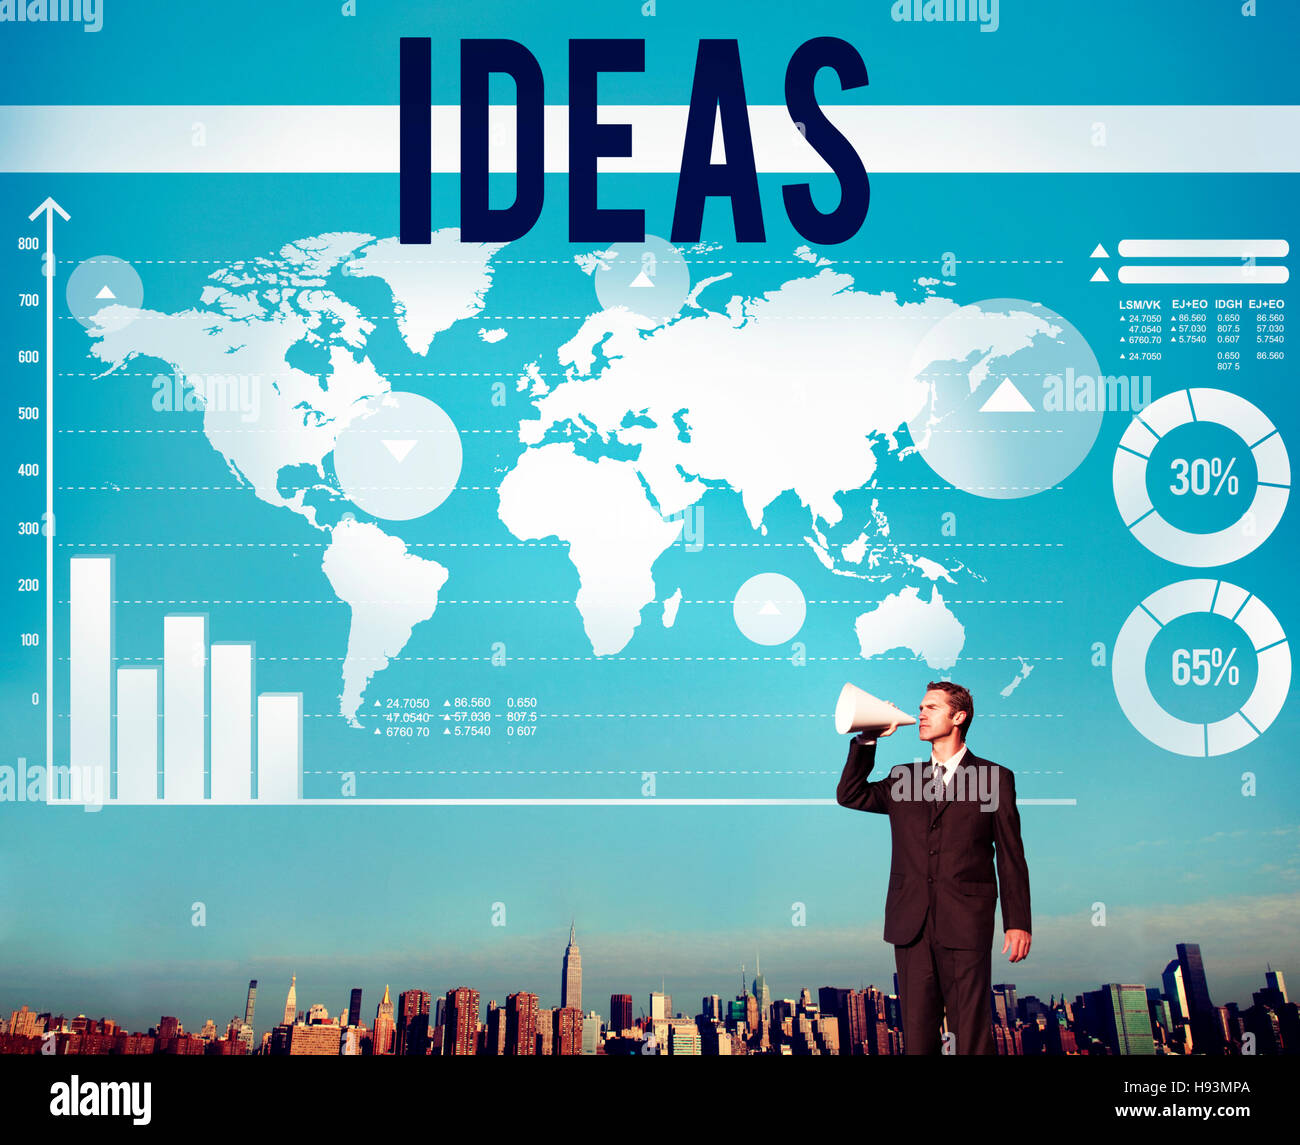 Digital Marketing World Business Megaphone Stock Photos & Digital ...